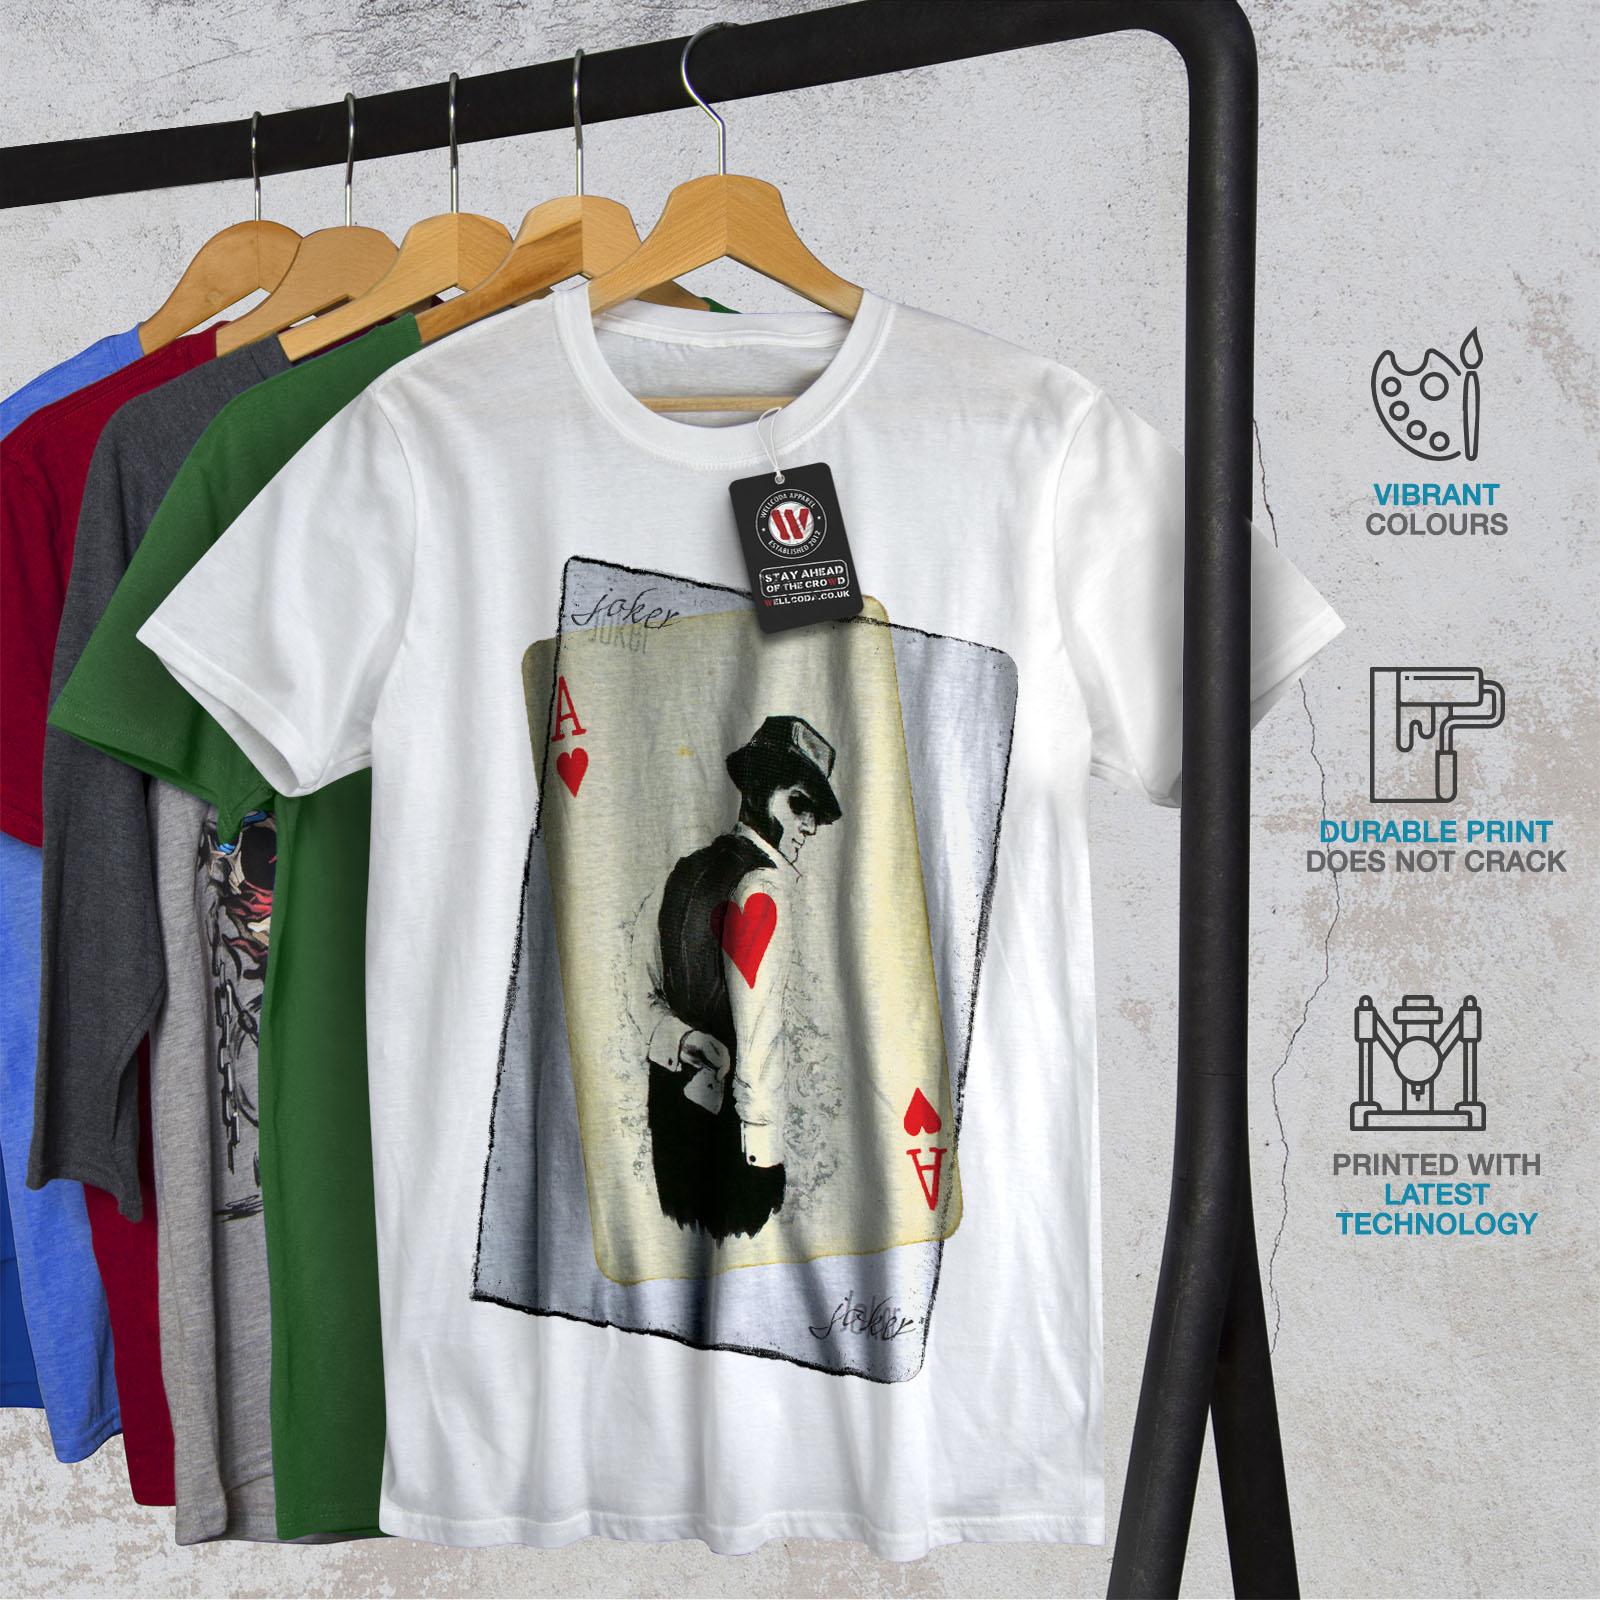 Wellcoda-POKER-misterioso-Da-Uomo-T-shirt-Gamble-design-grafico-stampato-T-shirt miniatura 12